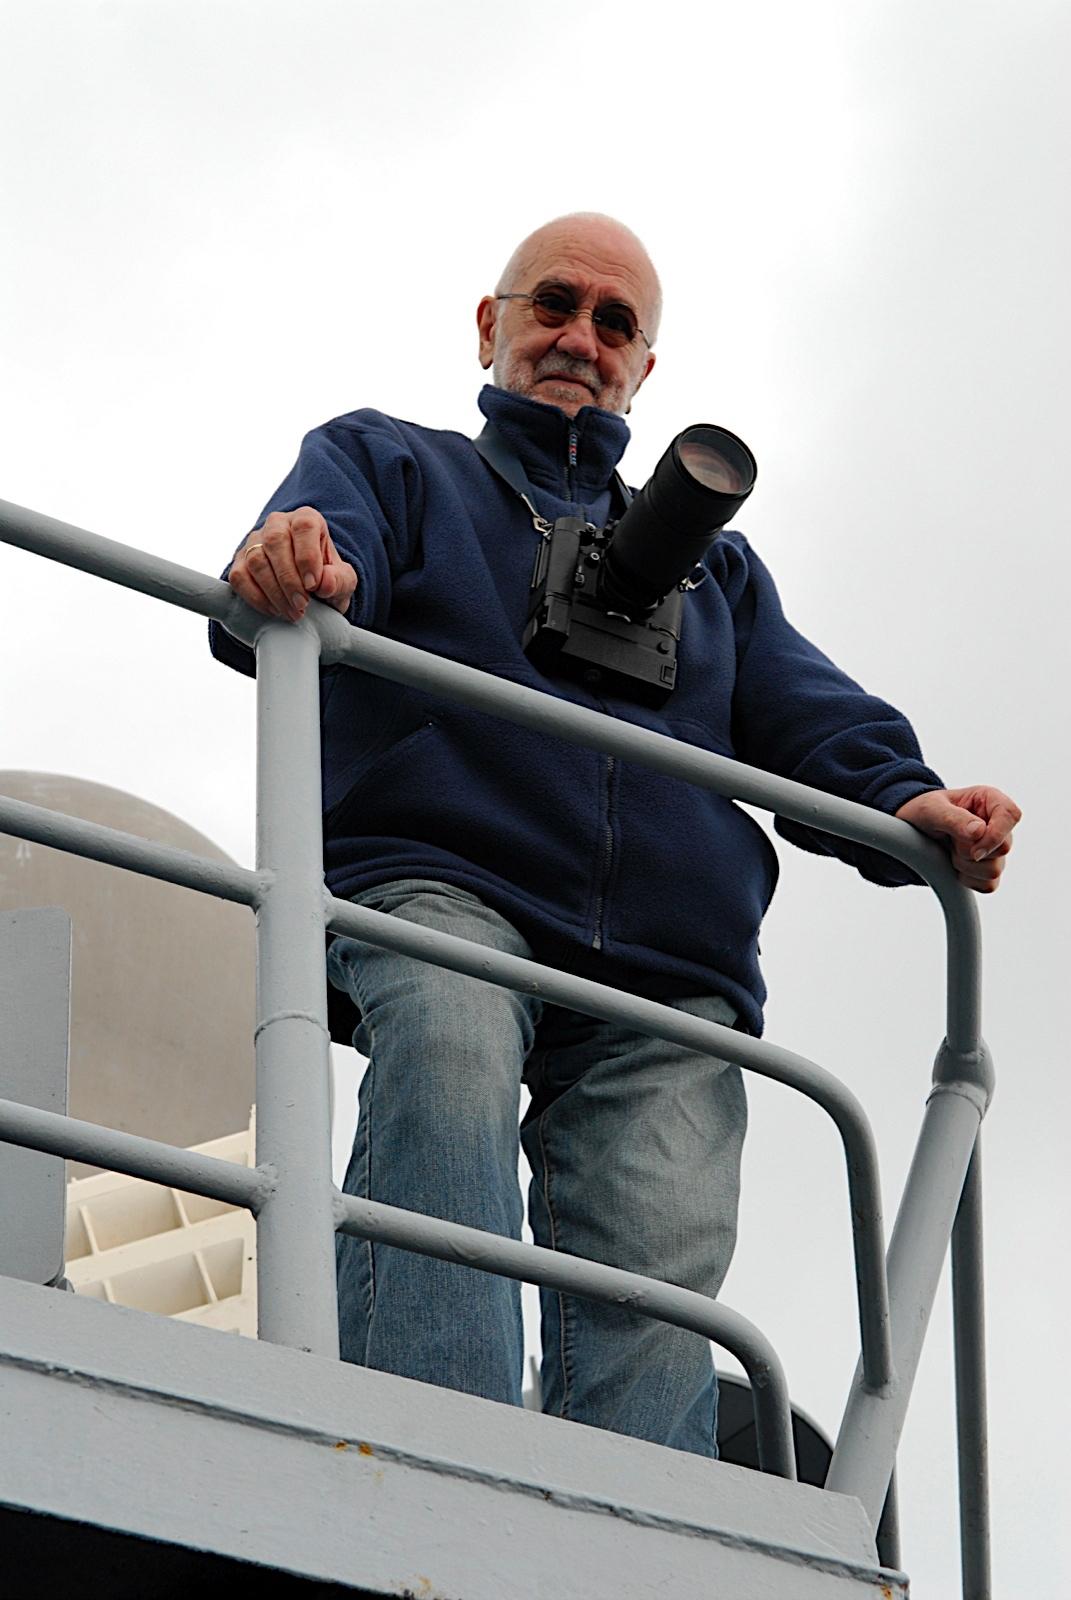 jeanne d'arc,bateau,new york,chourgnoz,photographie,reportage,bateua,mer,océan,marin,marins,légende,navire